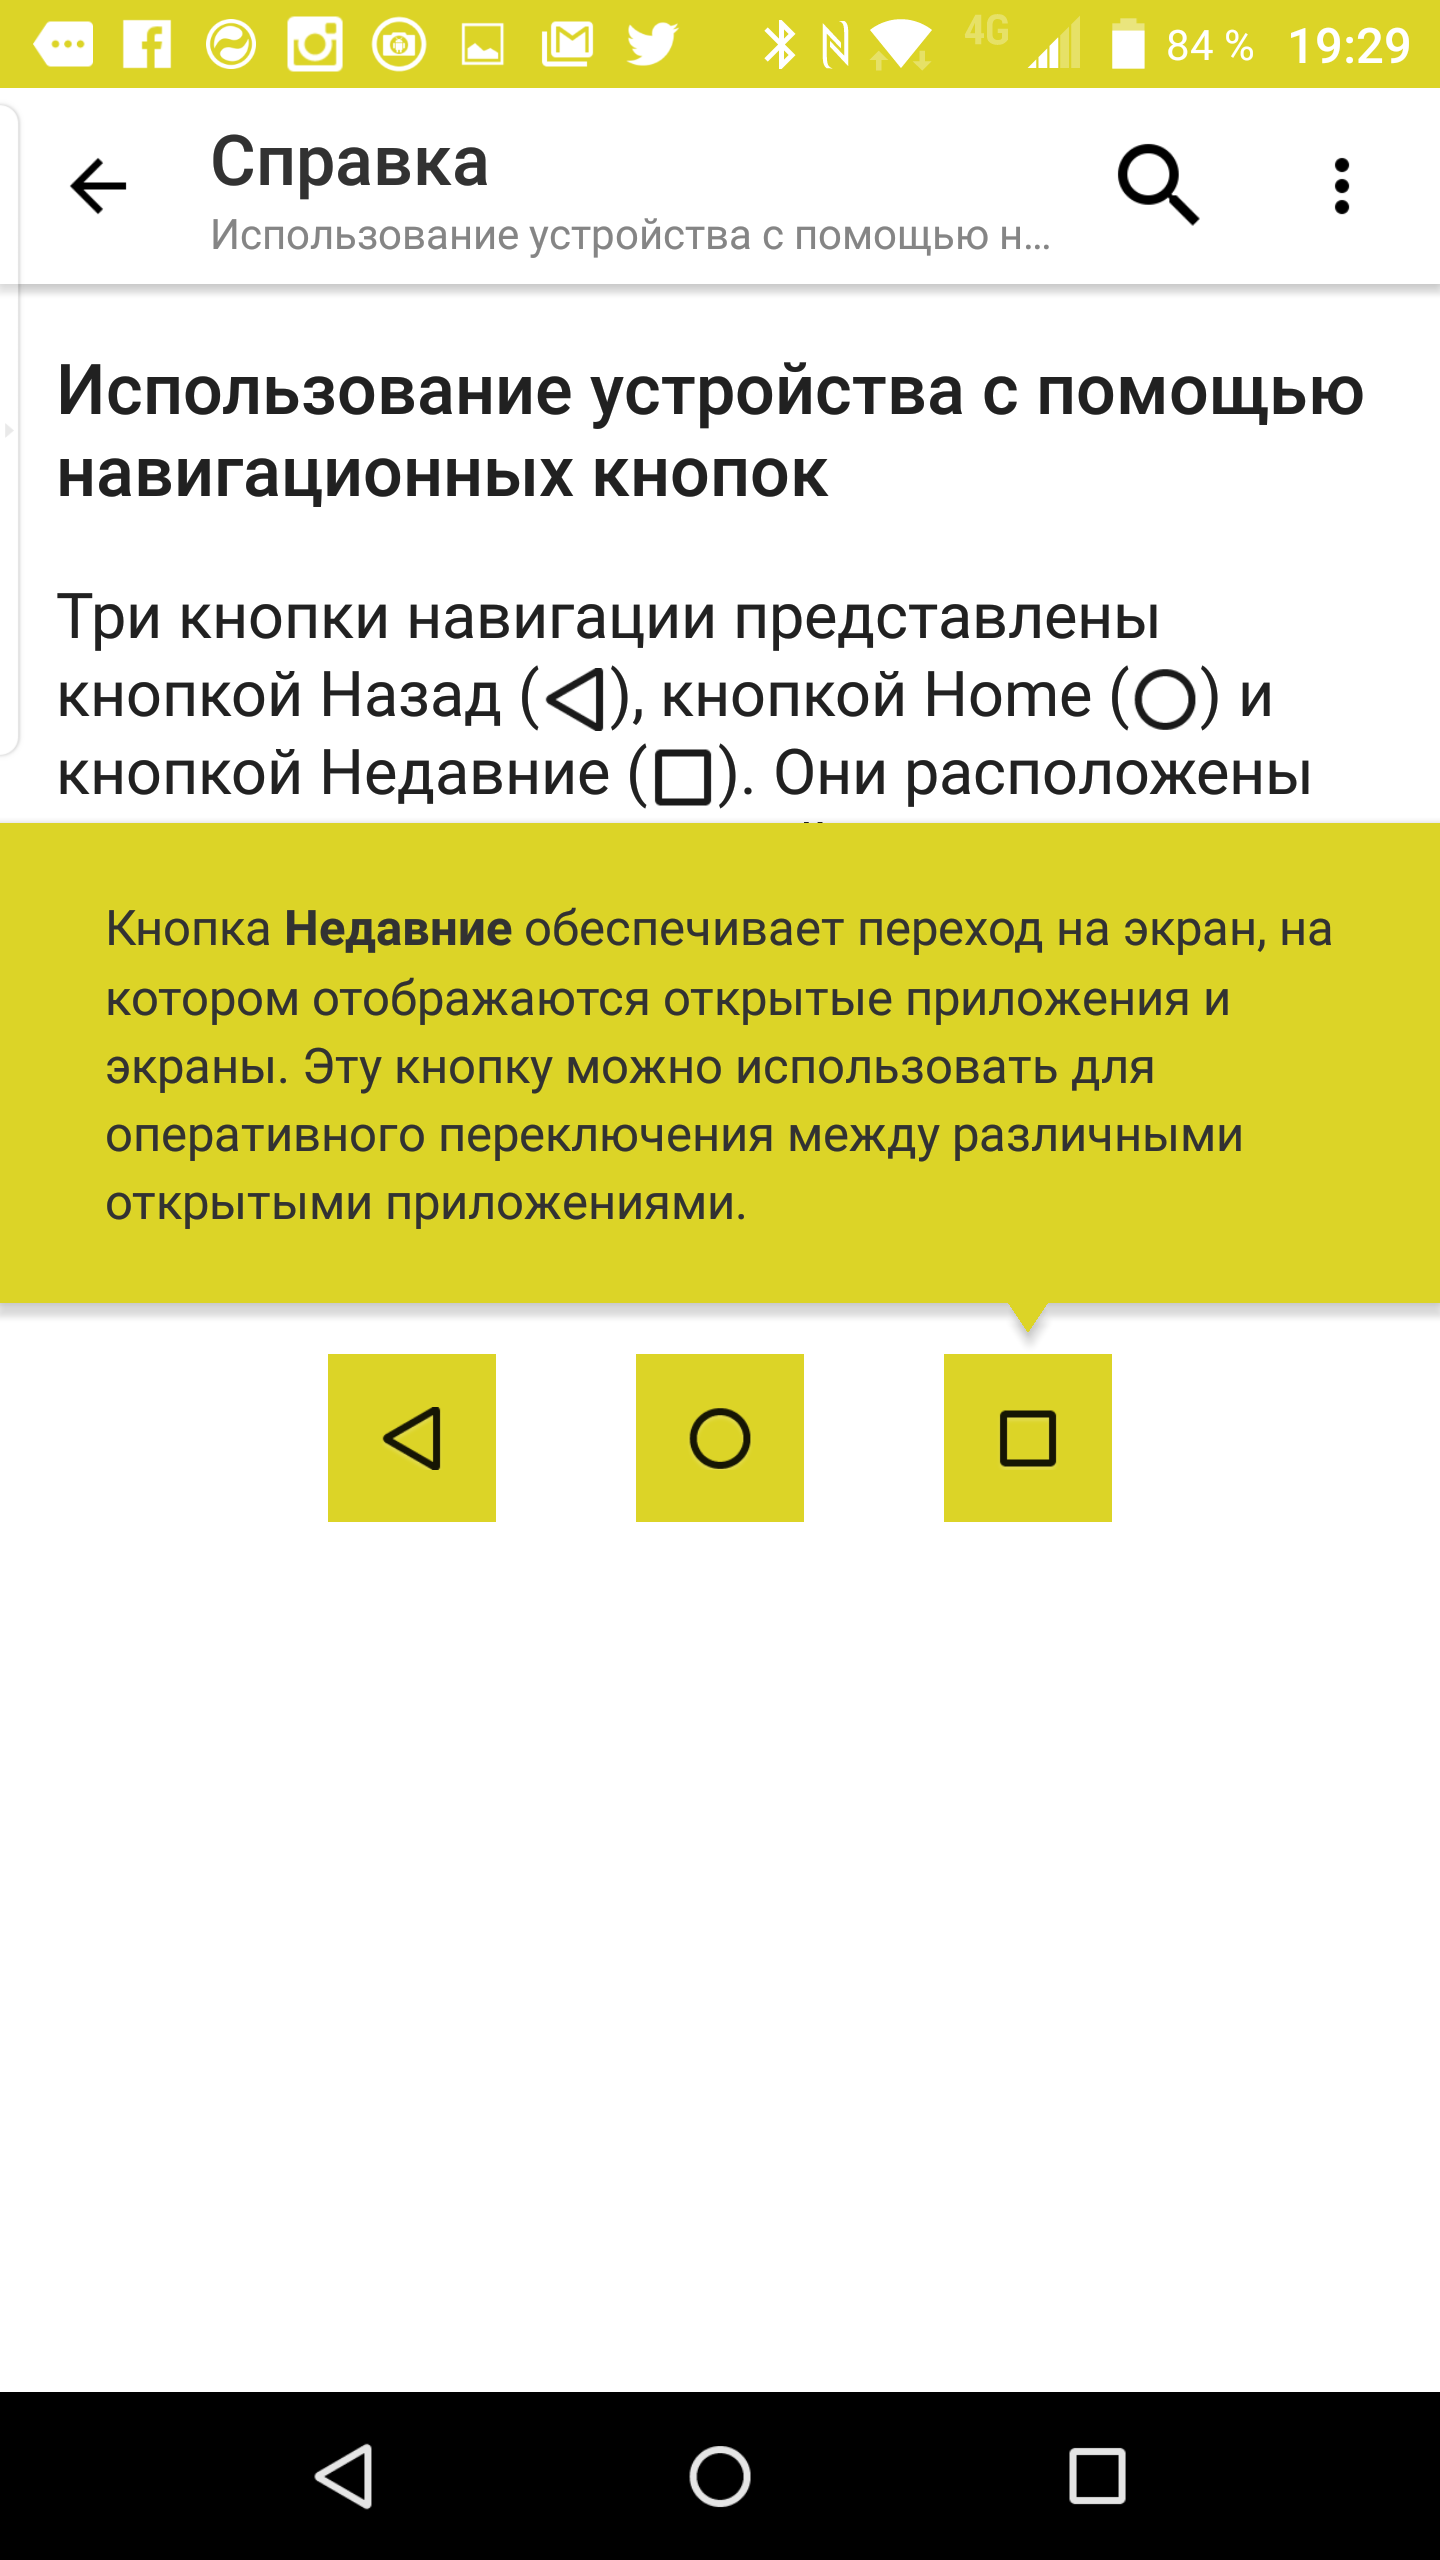 Screenshot_2016-02-09-19-29-31